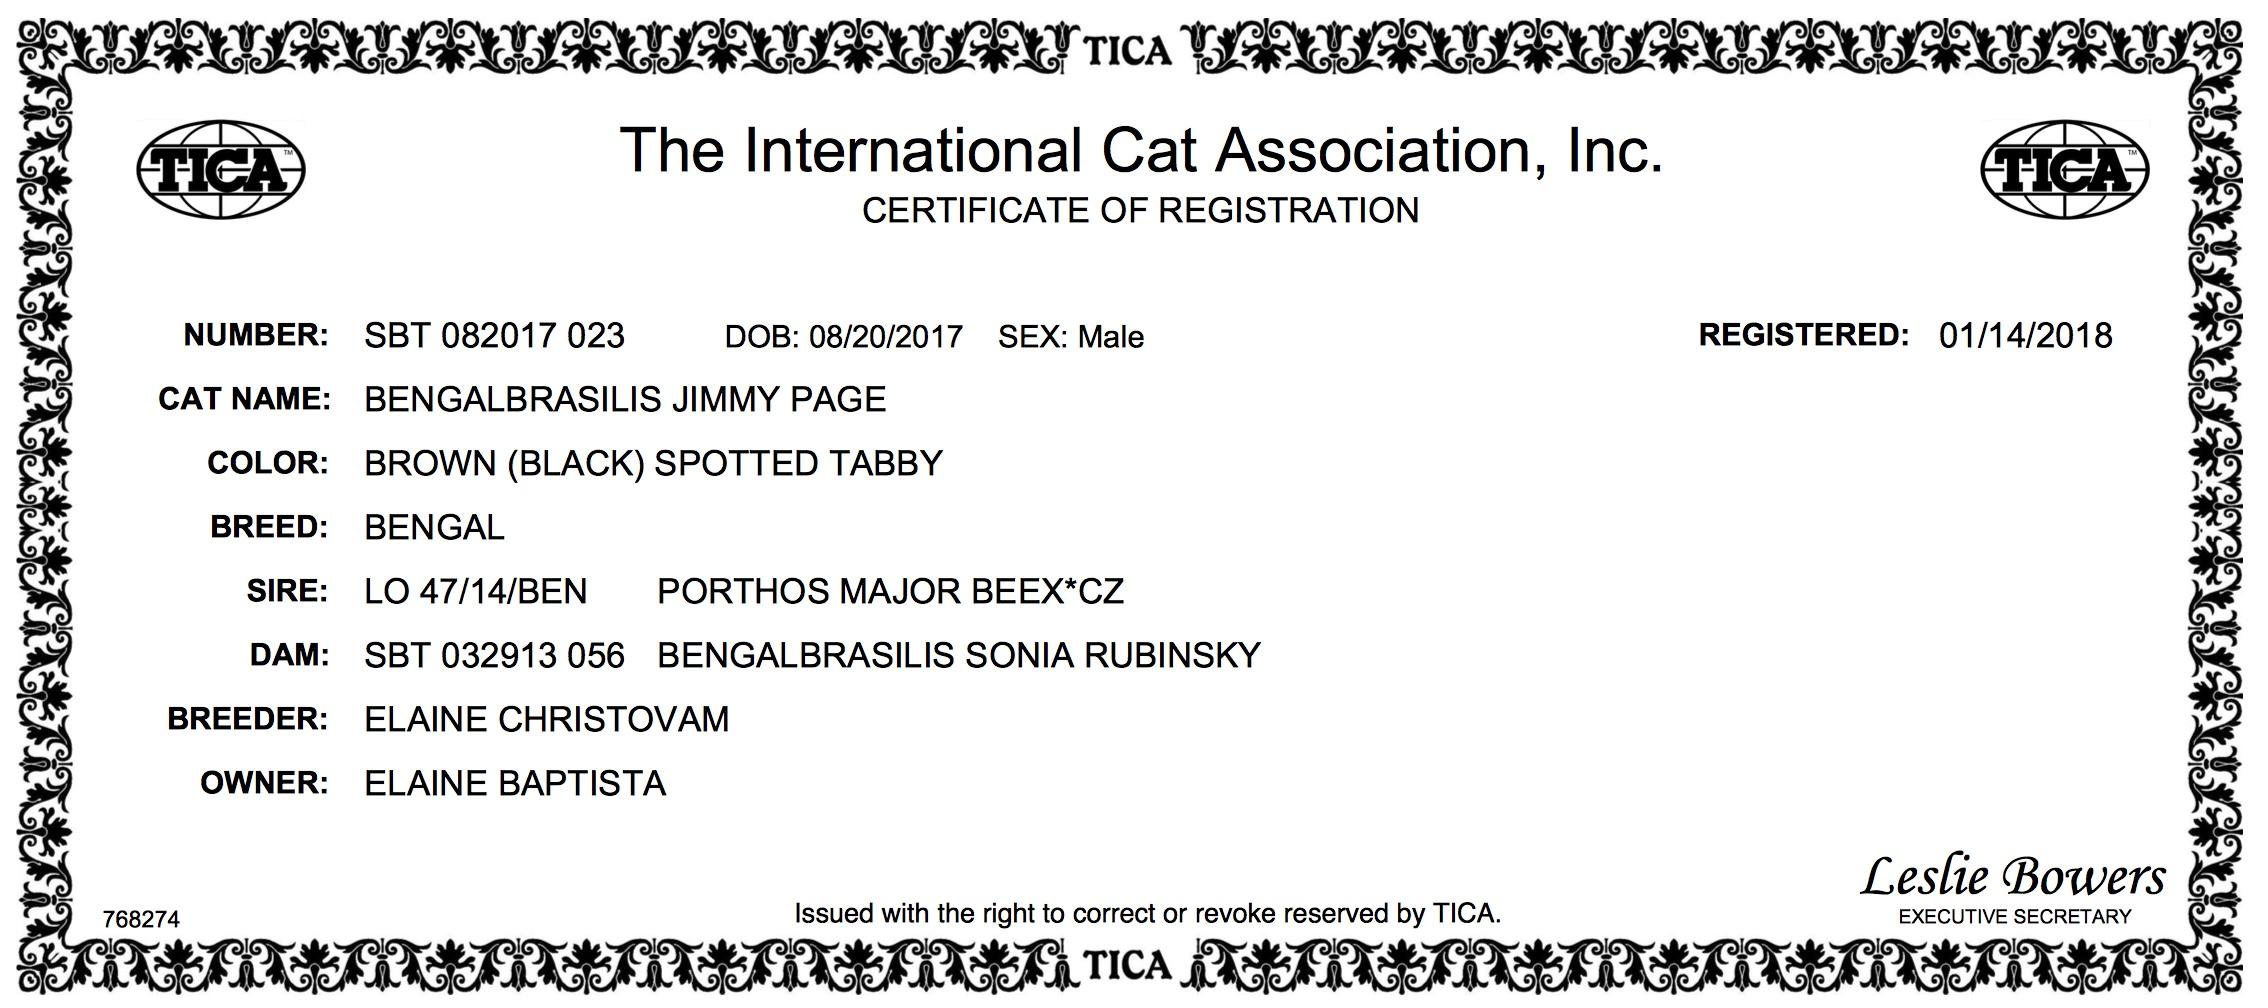 CERTIFICATE OF REGISTRATION Jimmy Page CAROLINA.jpeg